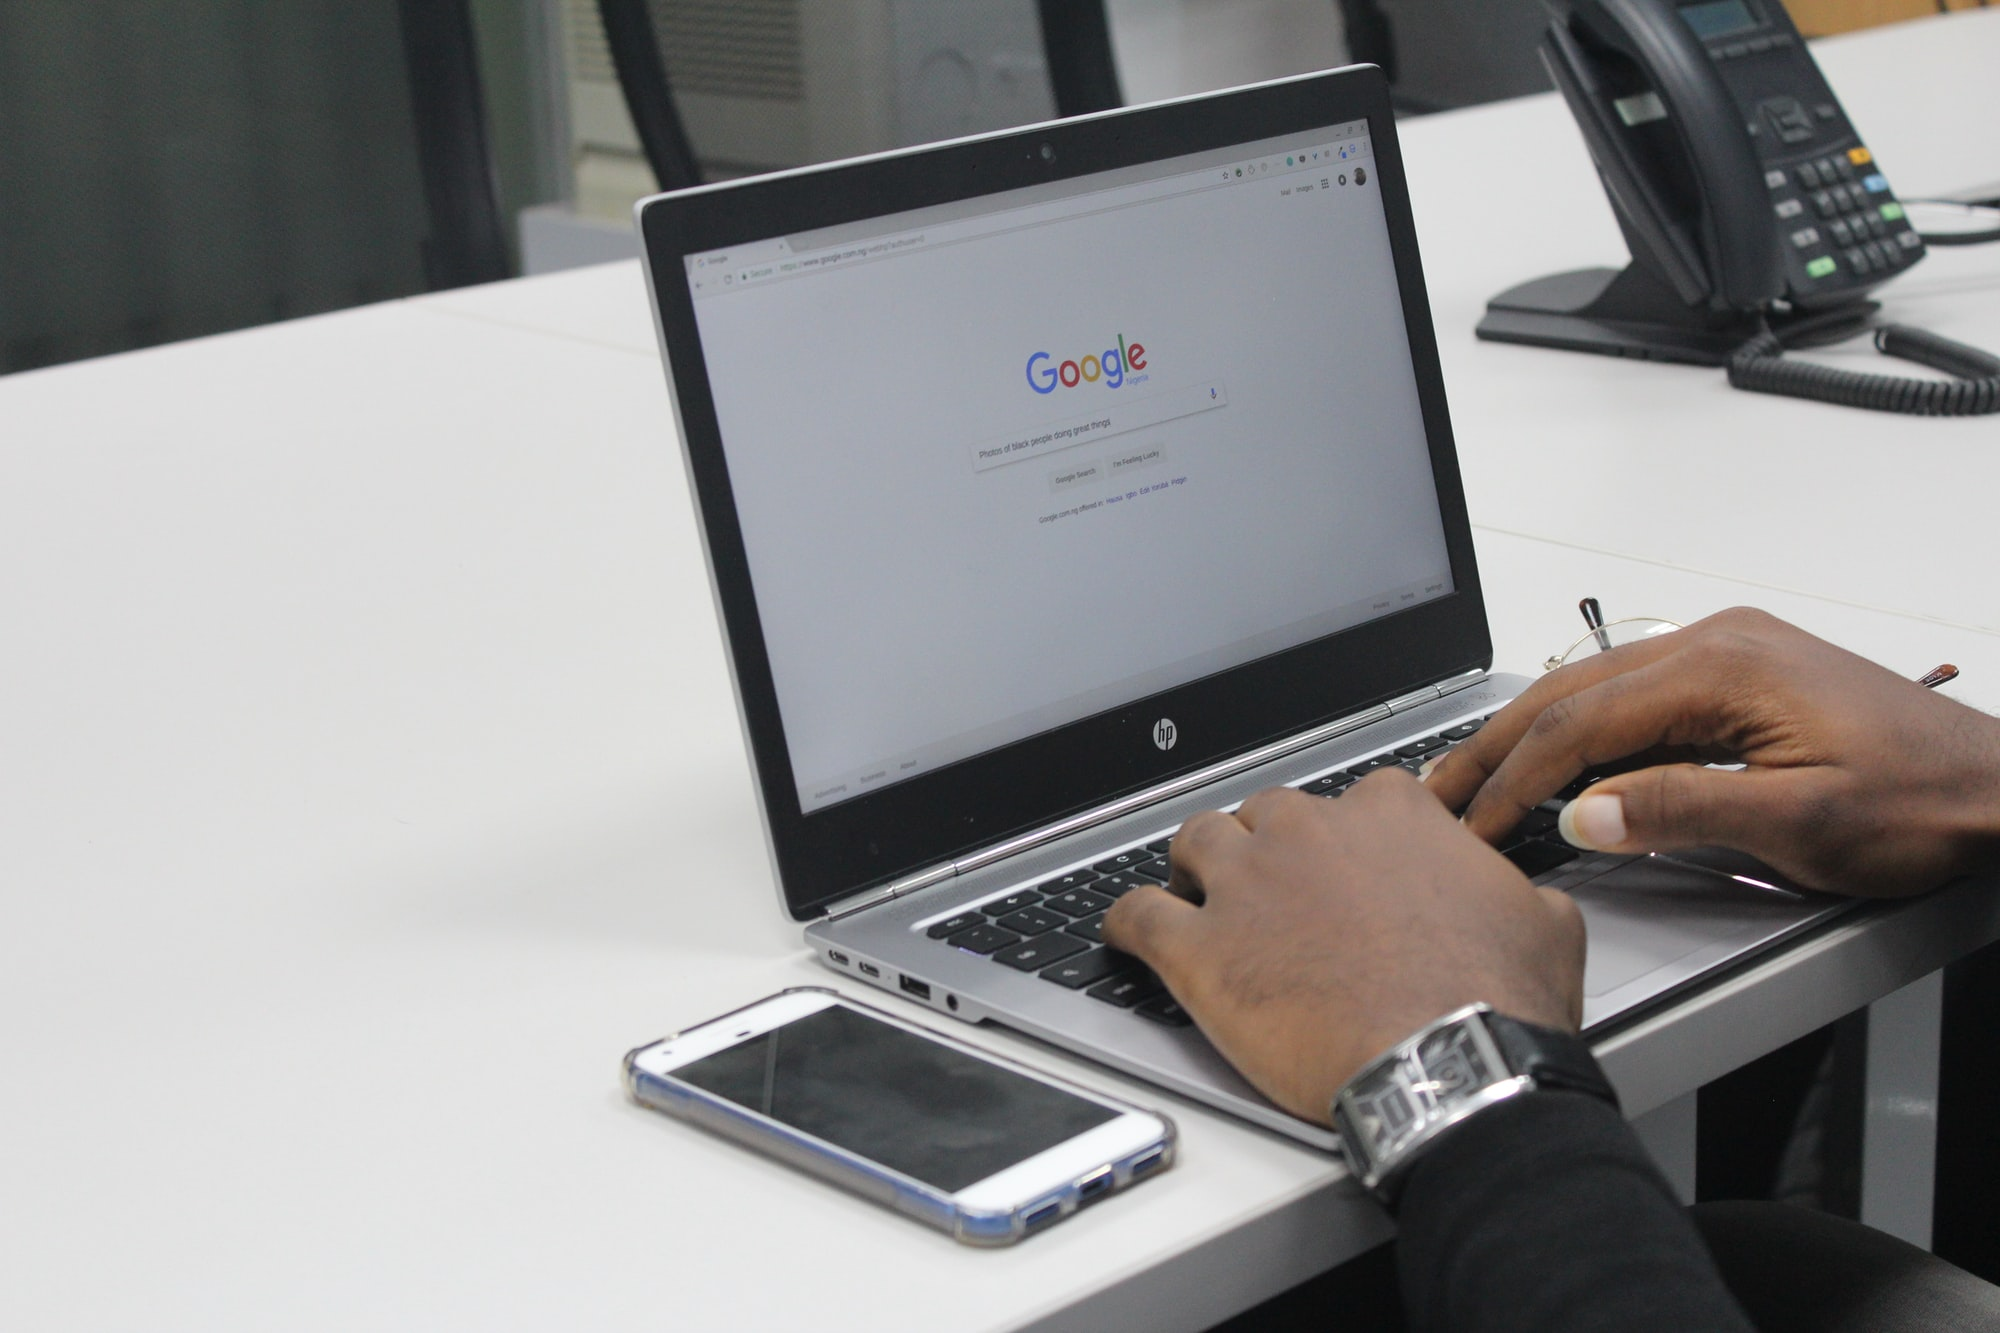 Google Docs Lagging While Writing: How to Optimize Google Docs